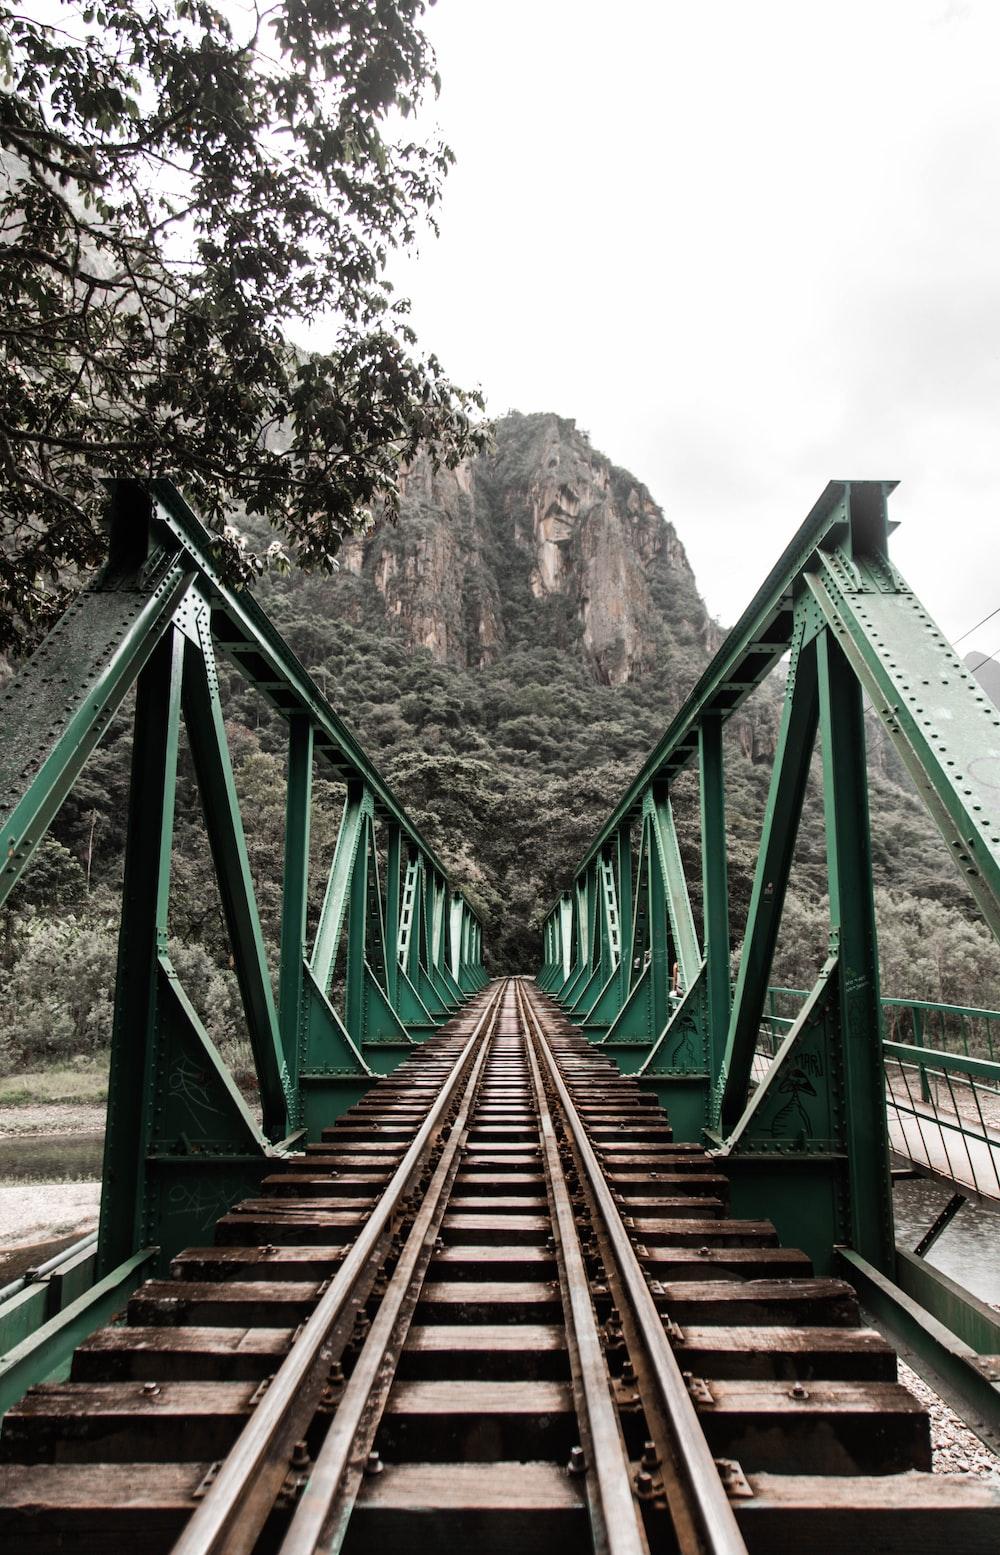 brown wooden bridge near brown mountain during daytime